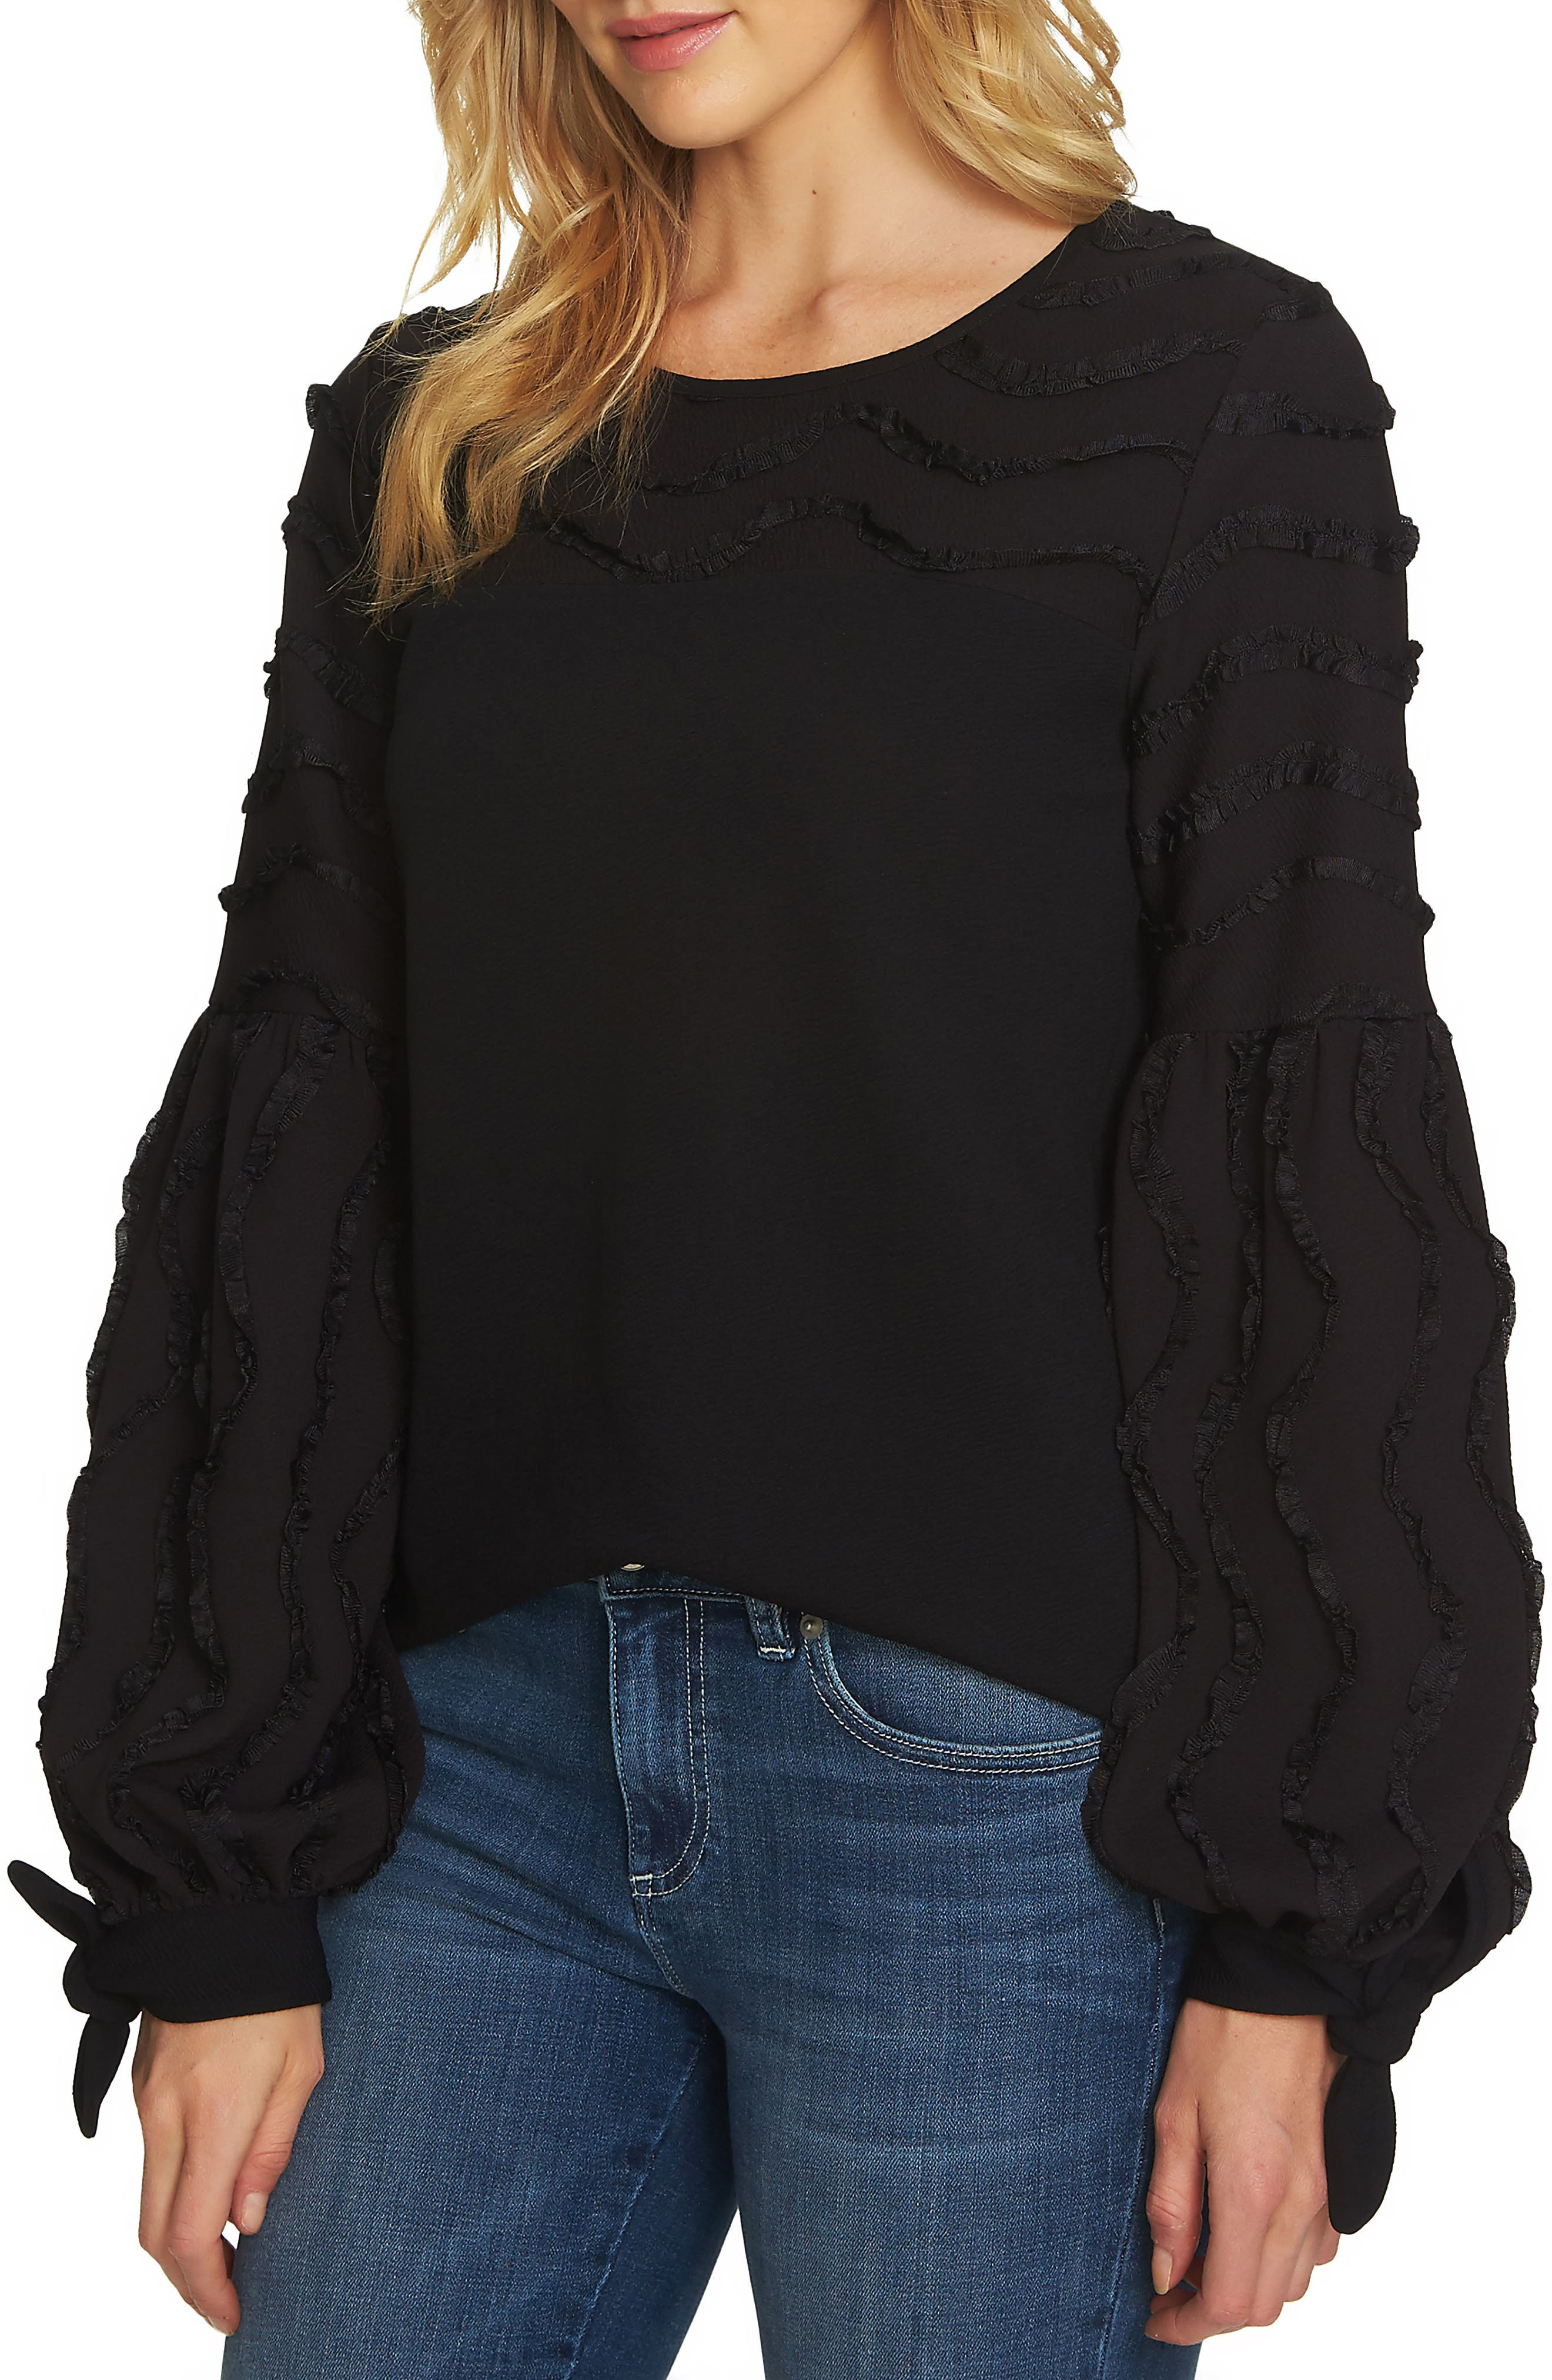 Balloon Sleeve Textured Knit Top,                             Main thumbnail 1, color,                             Rich Black